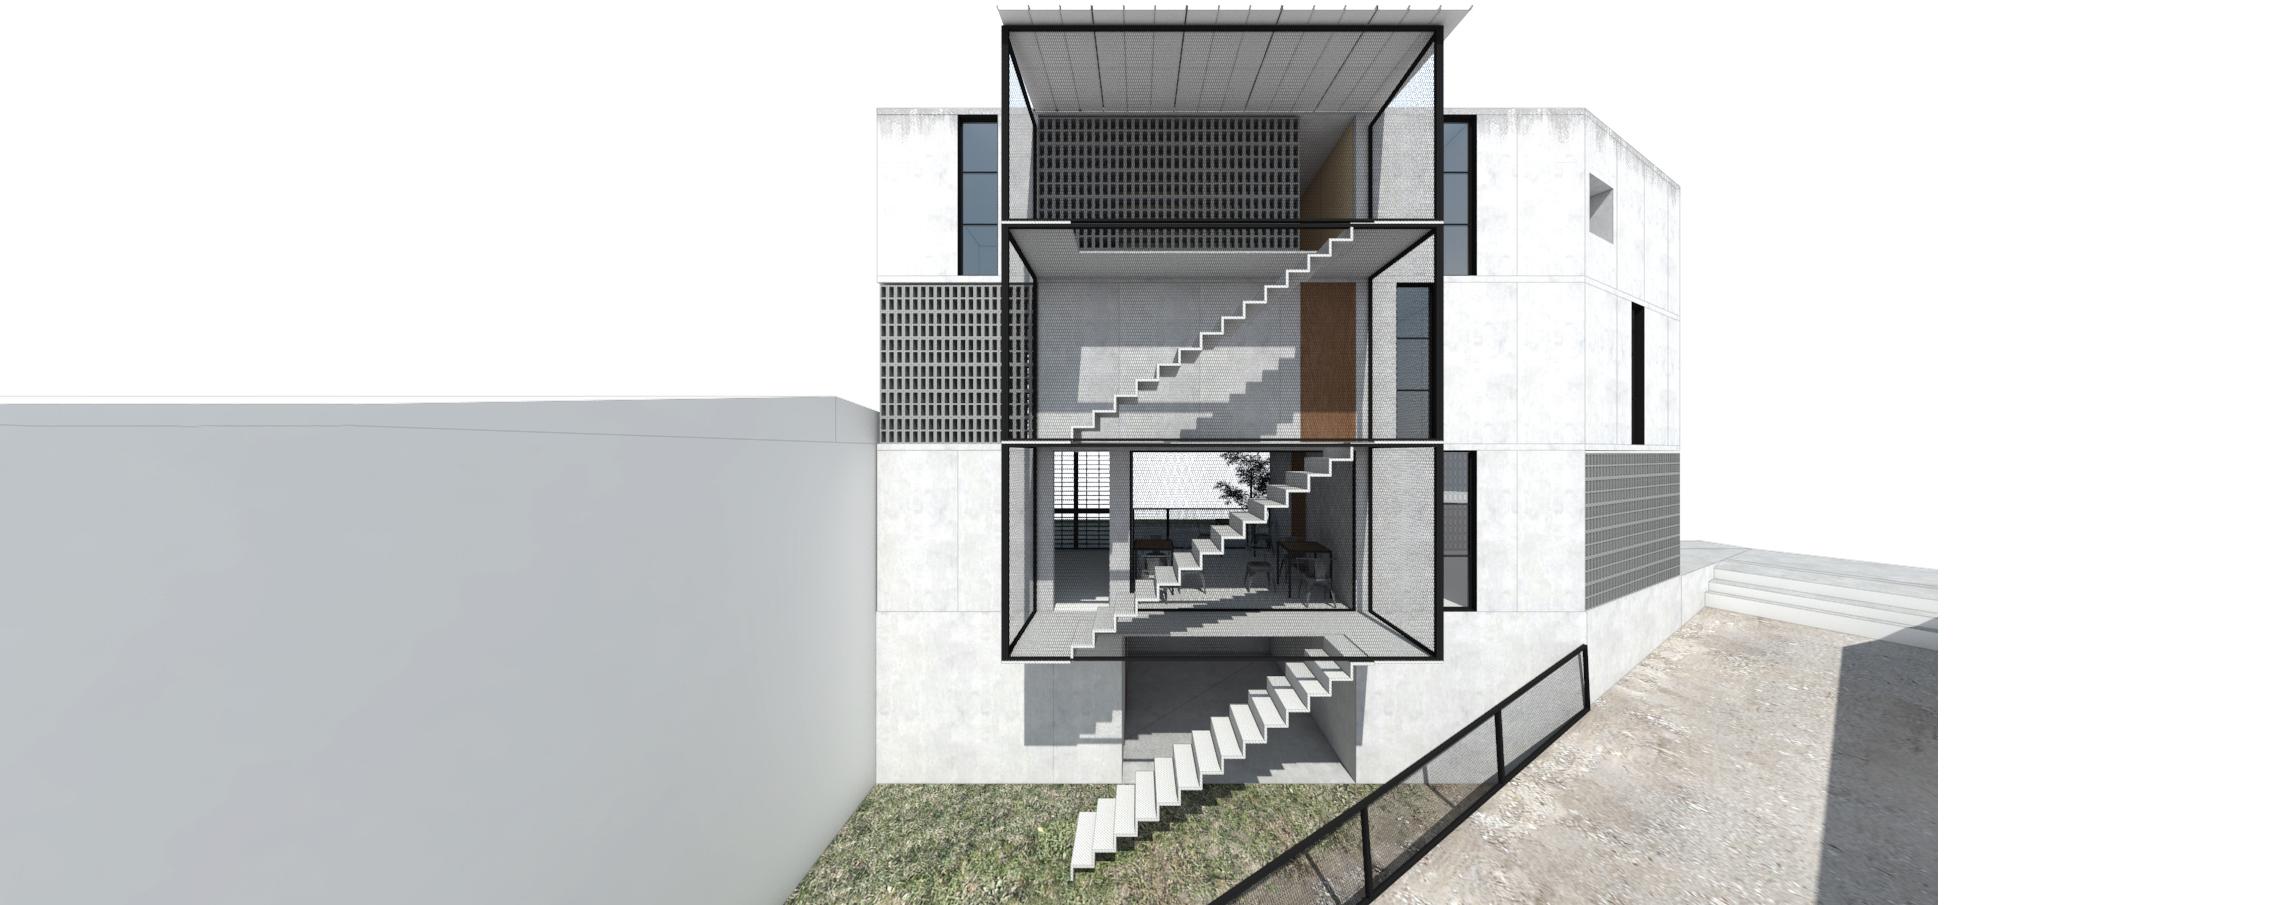 Casa Acarraz: render exterior